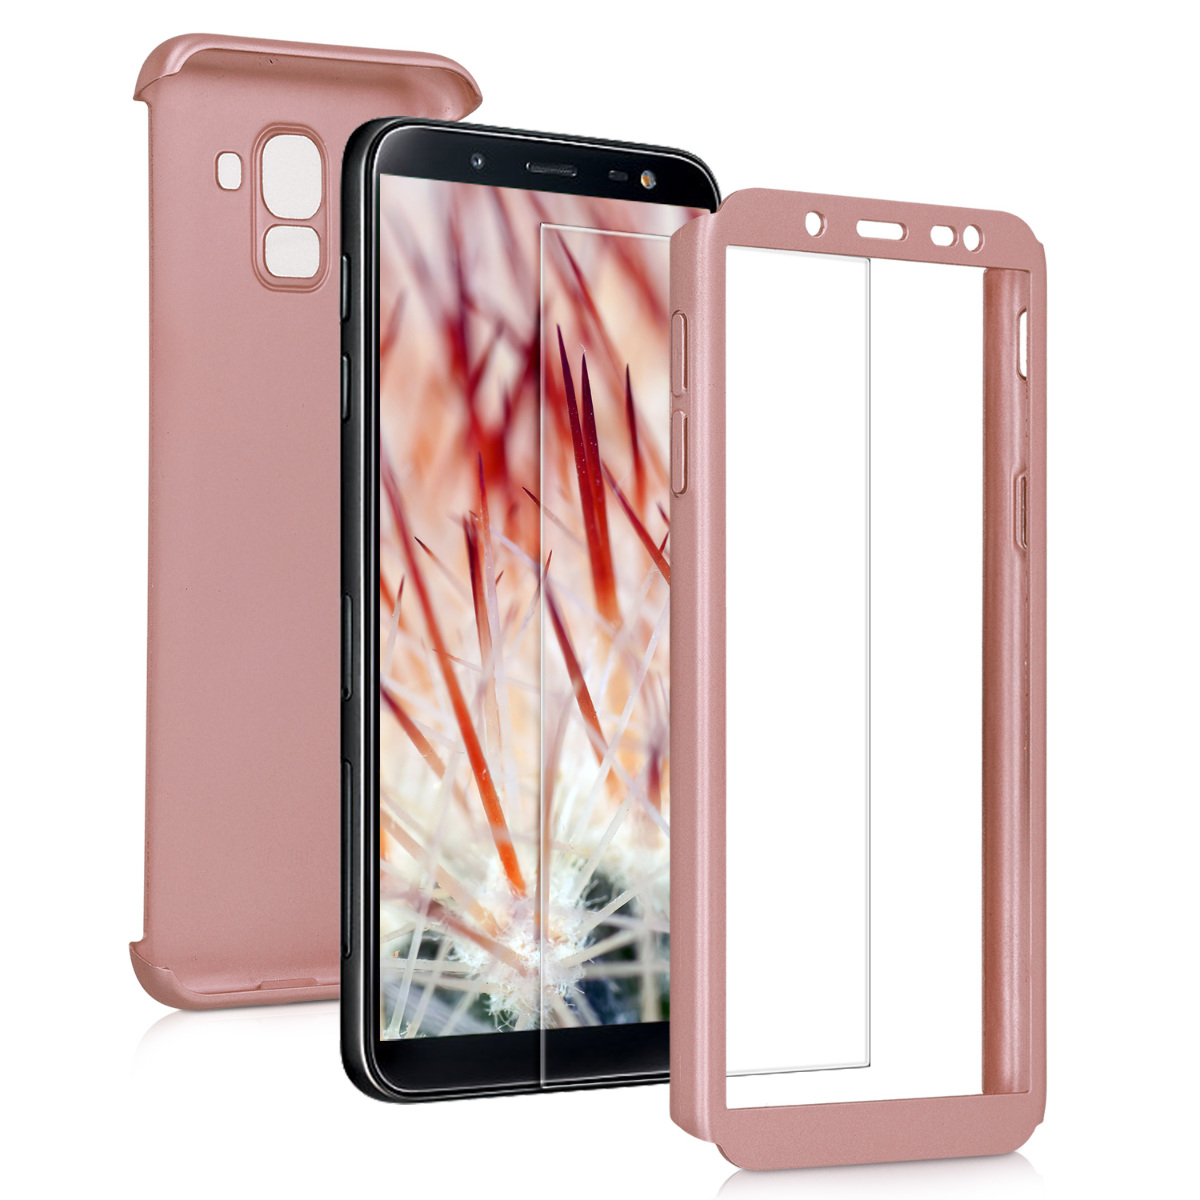 KW Θήκη Full Body Samsung Galaxy J6 (2018) & Tempered Glass - Metallic Rose Gold (46591.31)